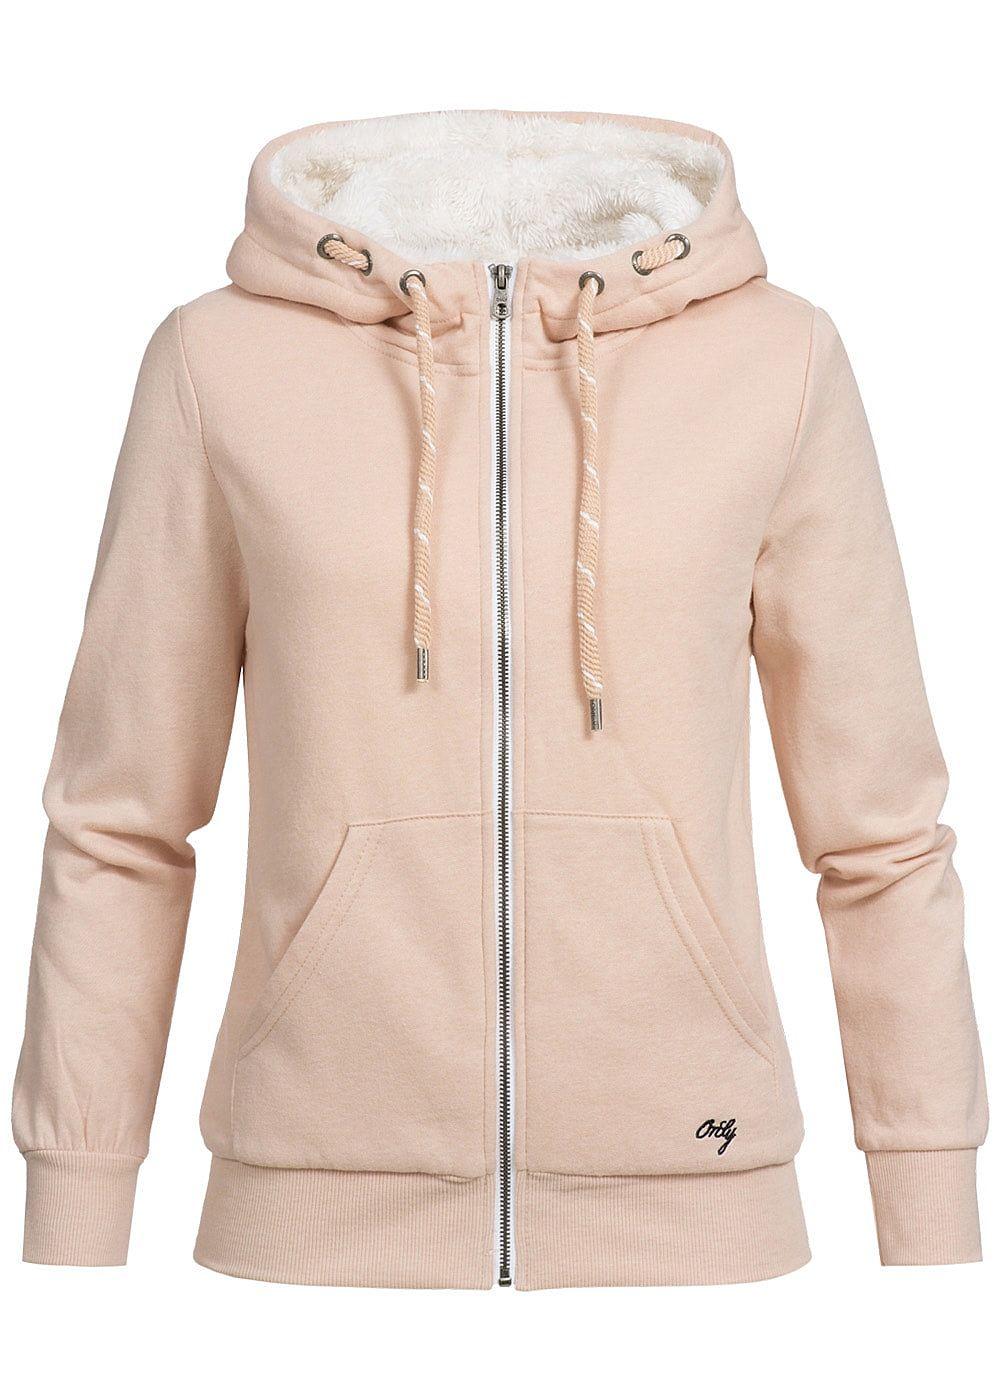 only damen zip hoodie kapuze teddyfutter 2 taschen cameo. Black Bedroom Furniture Sets. Home Design Ideas